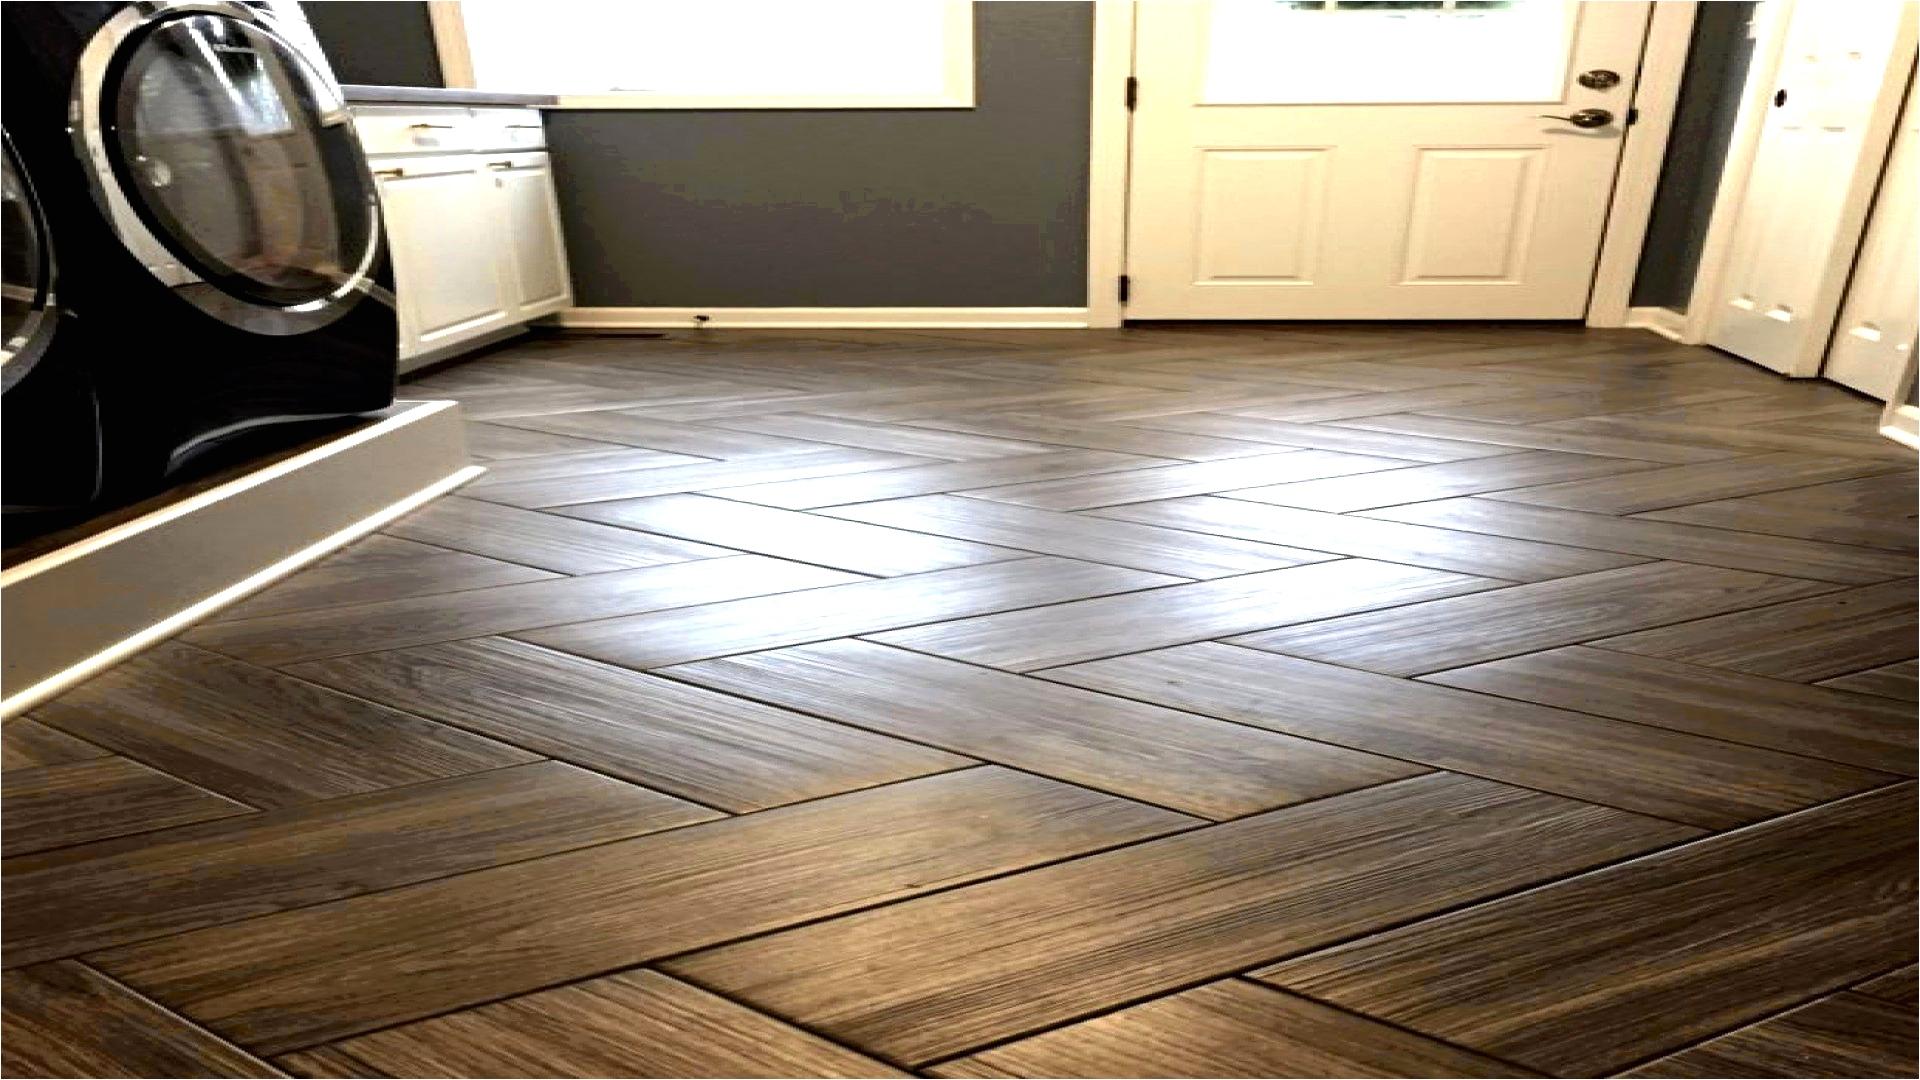 Porcelain Floor Cleaner 50 Luxury Clean Shower Floor Tile Pics 50 Photos Home Improvement